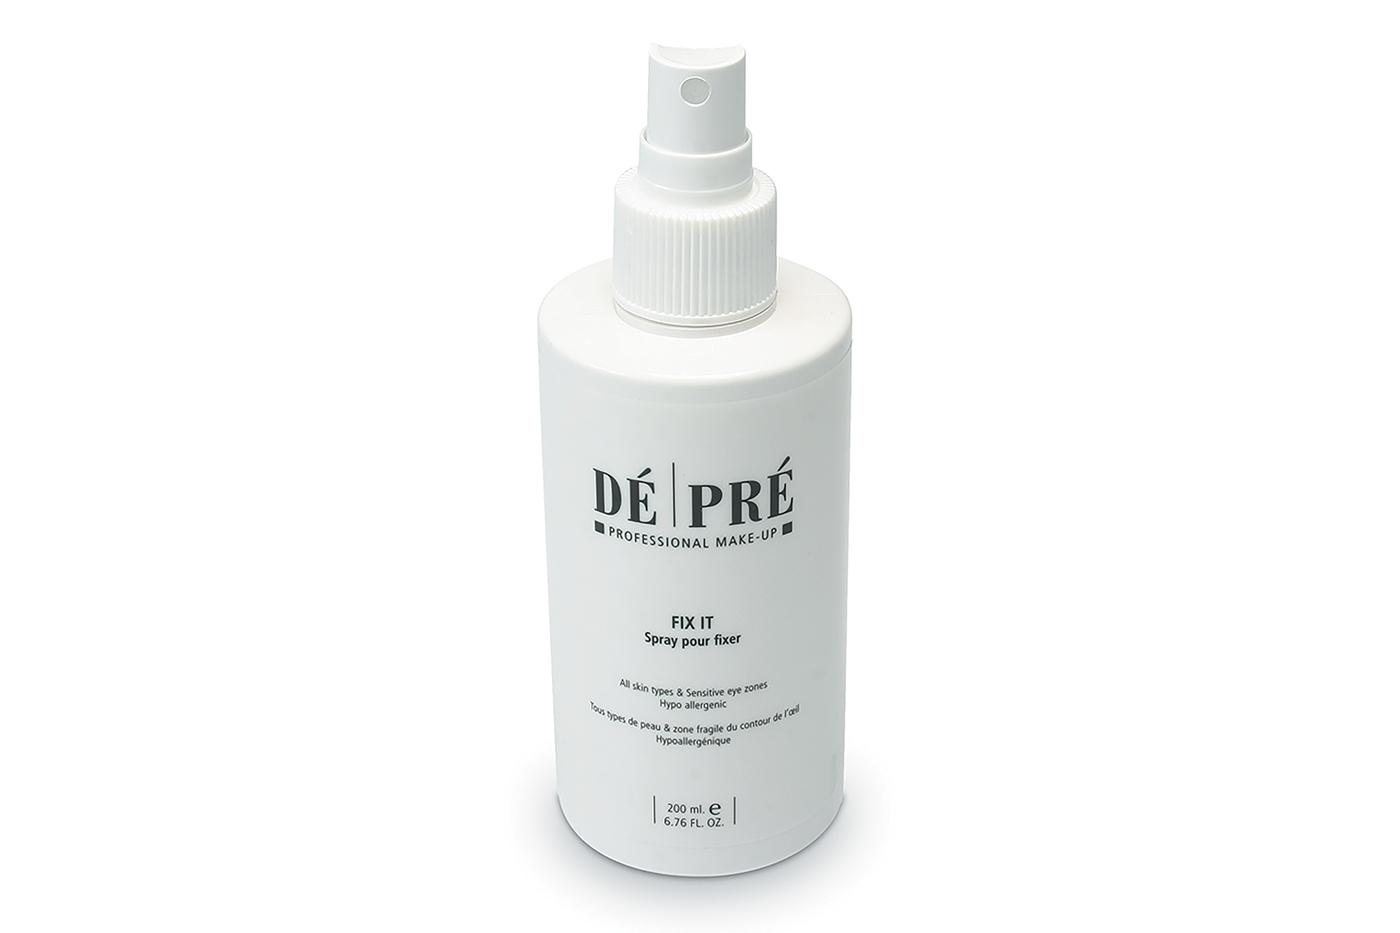 Make-up Studio's fixing spray for flawless skin